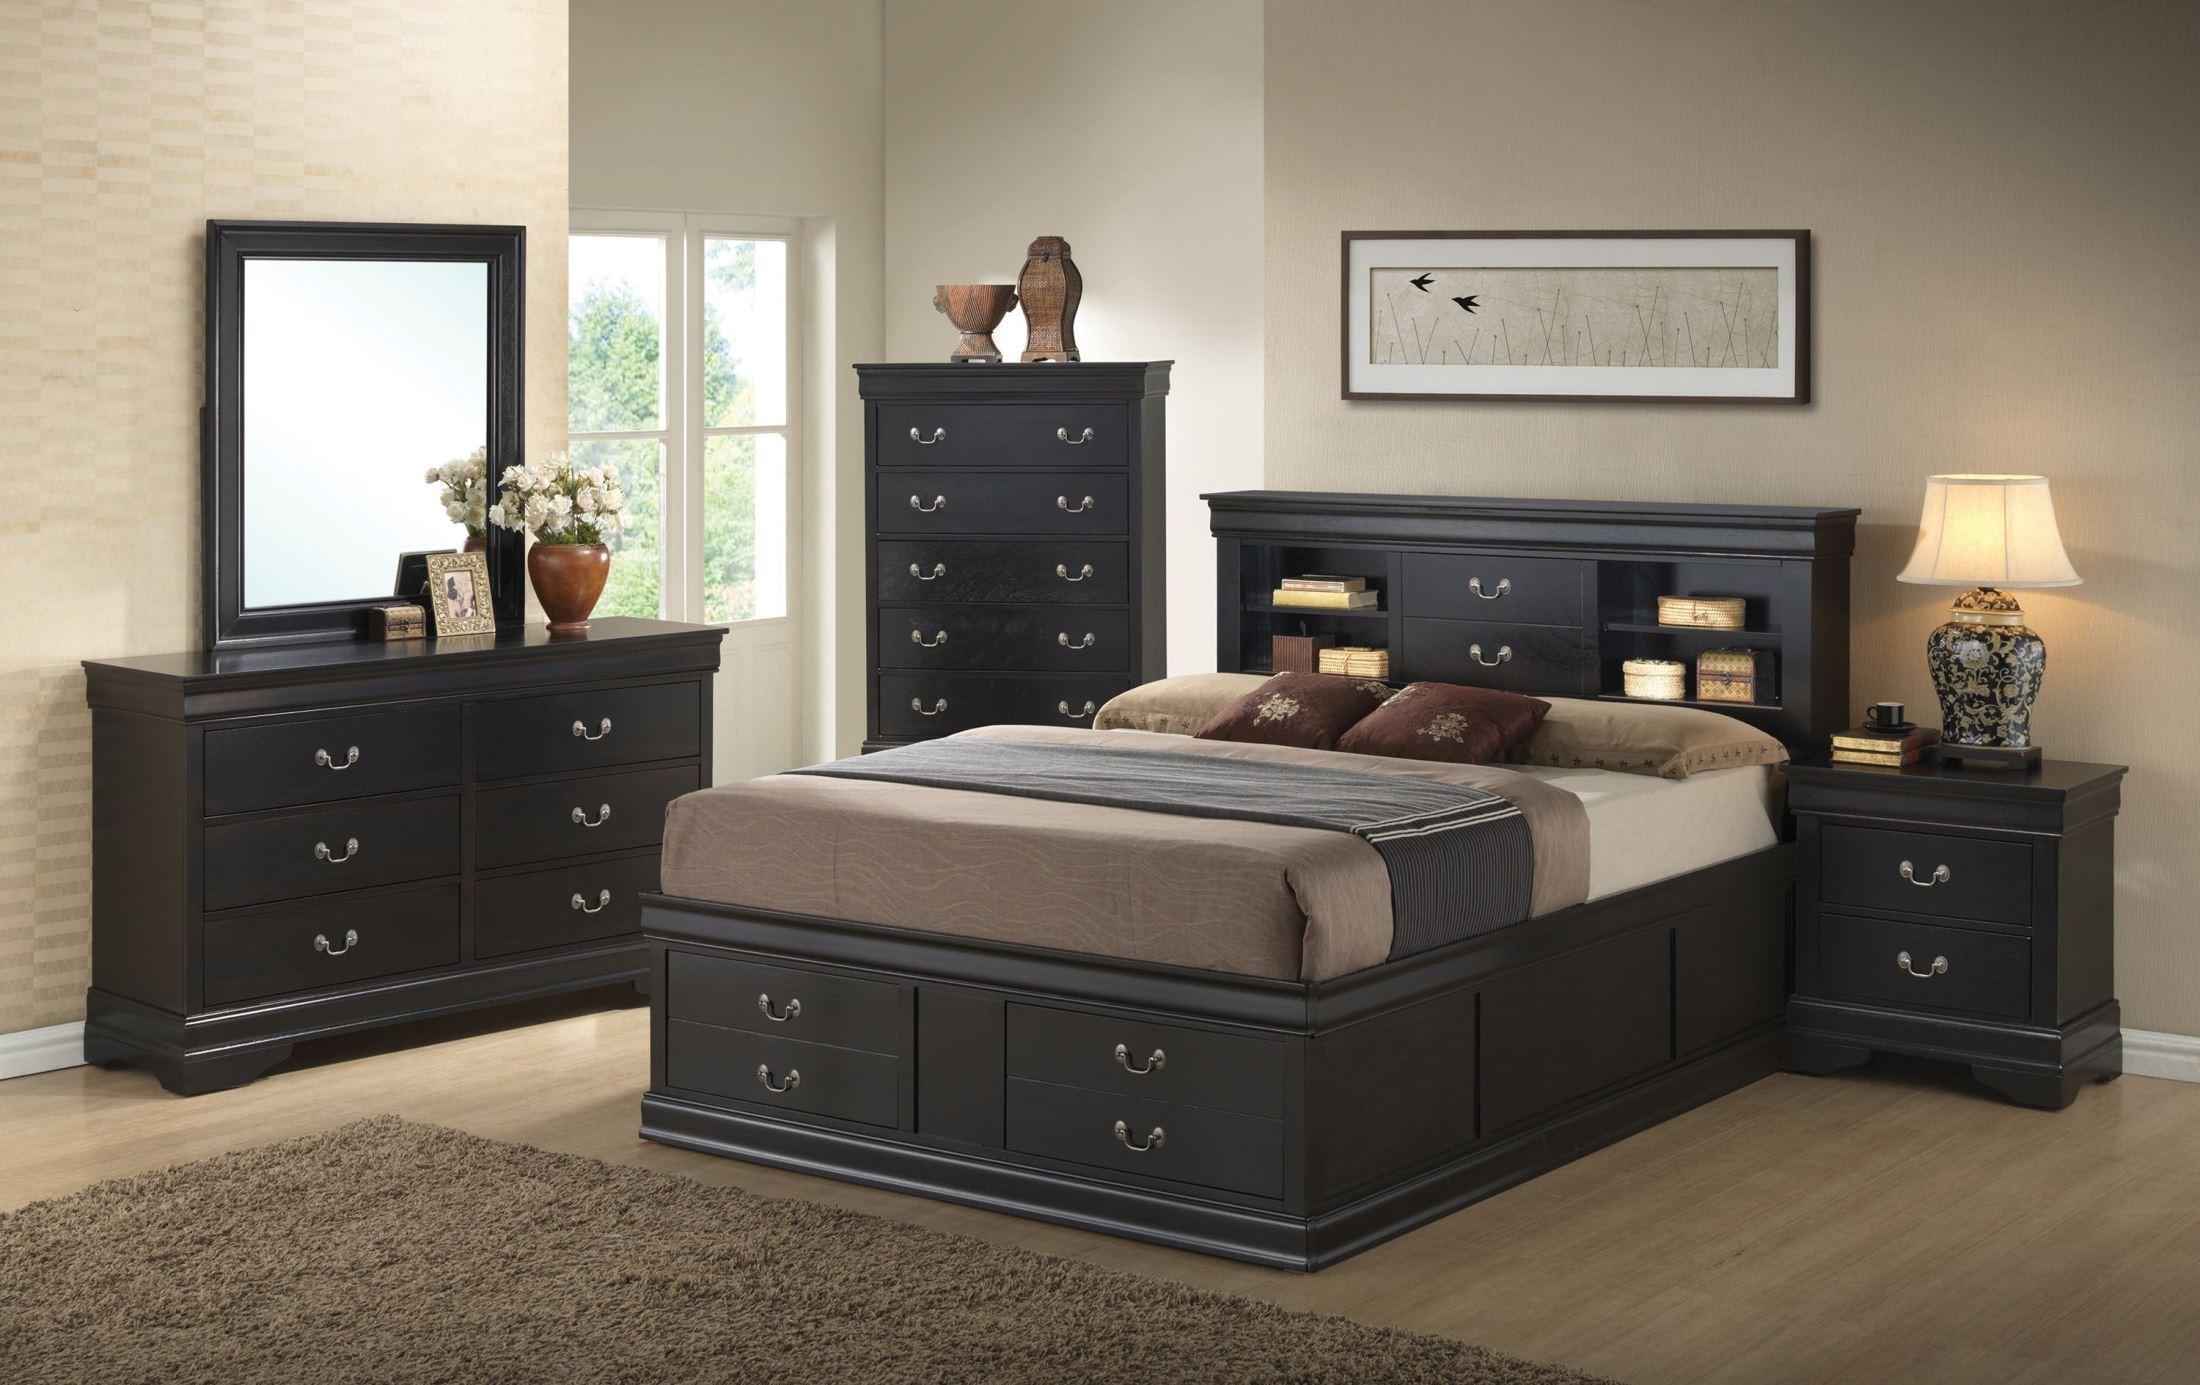 King louis bedroom furniture